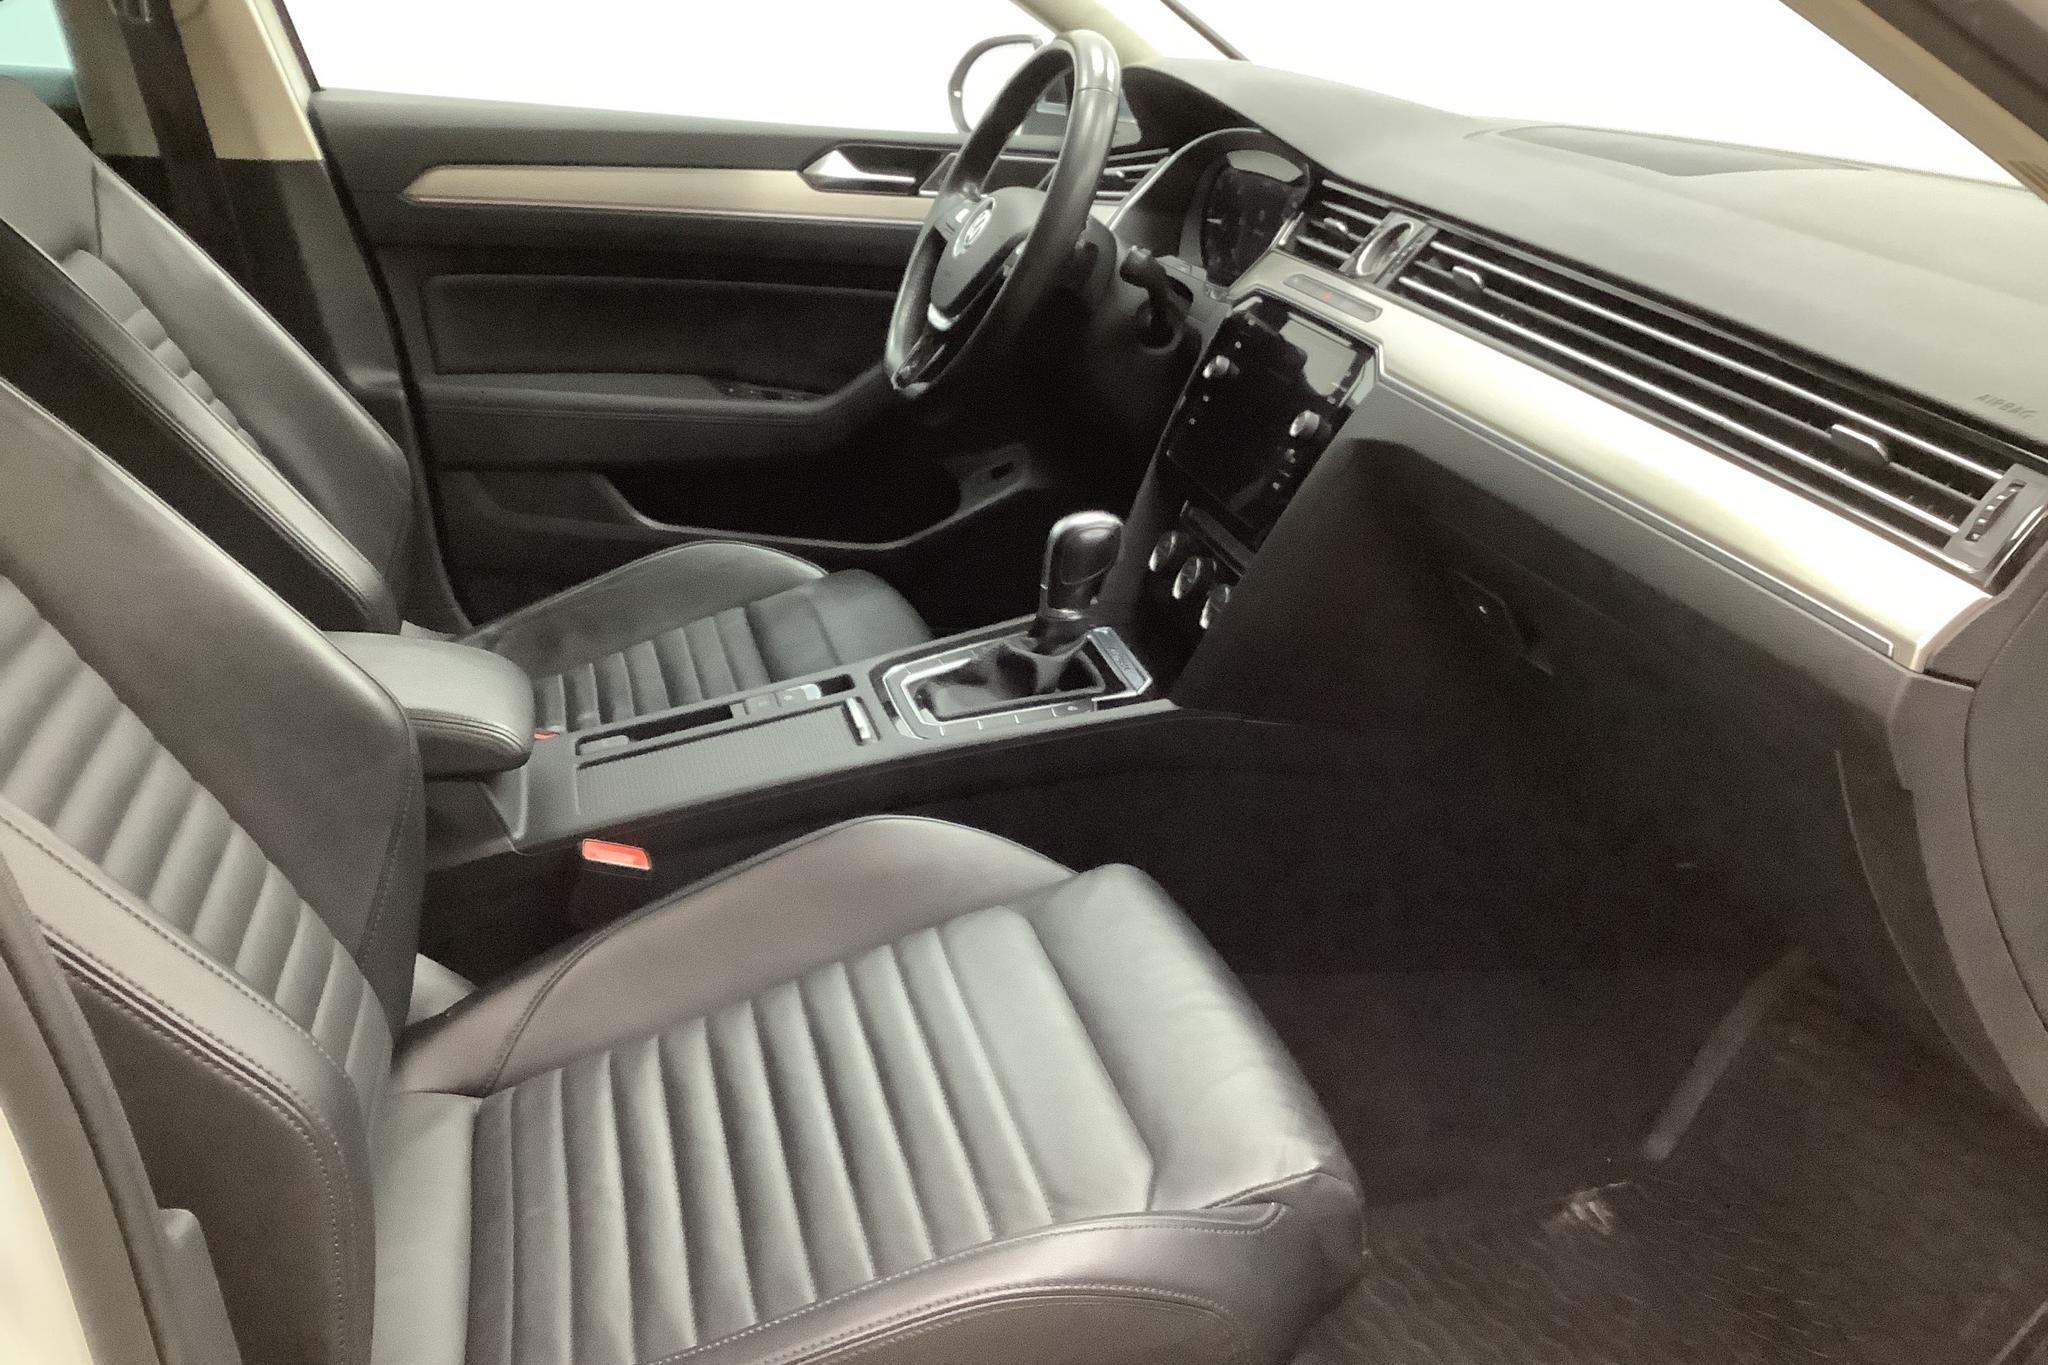 VW Passat Alltrack 2.0 TDI Sportscombi 4MOTION (190hk) - 138 330 km - Automatic - white - 2018